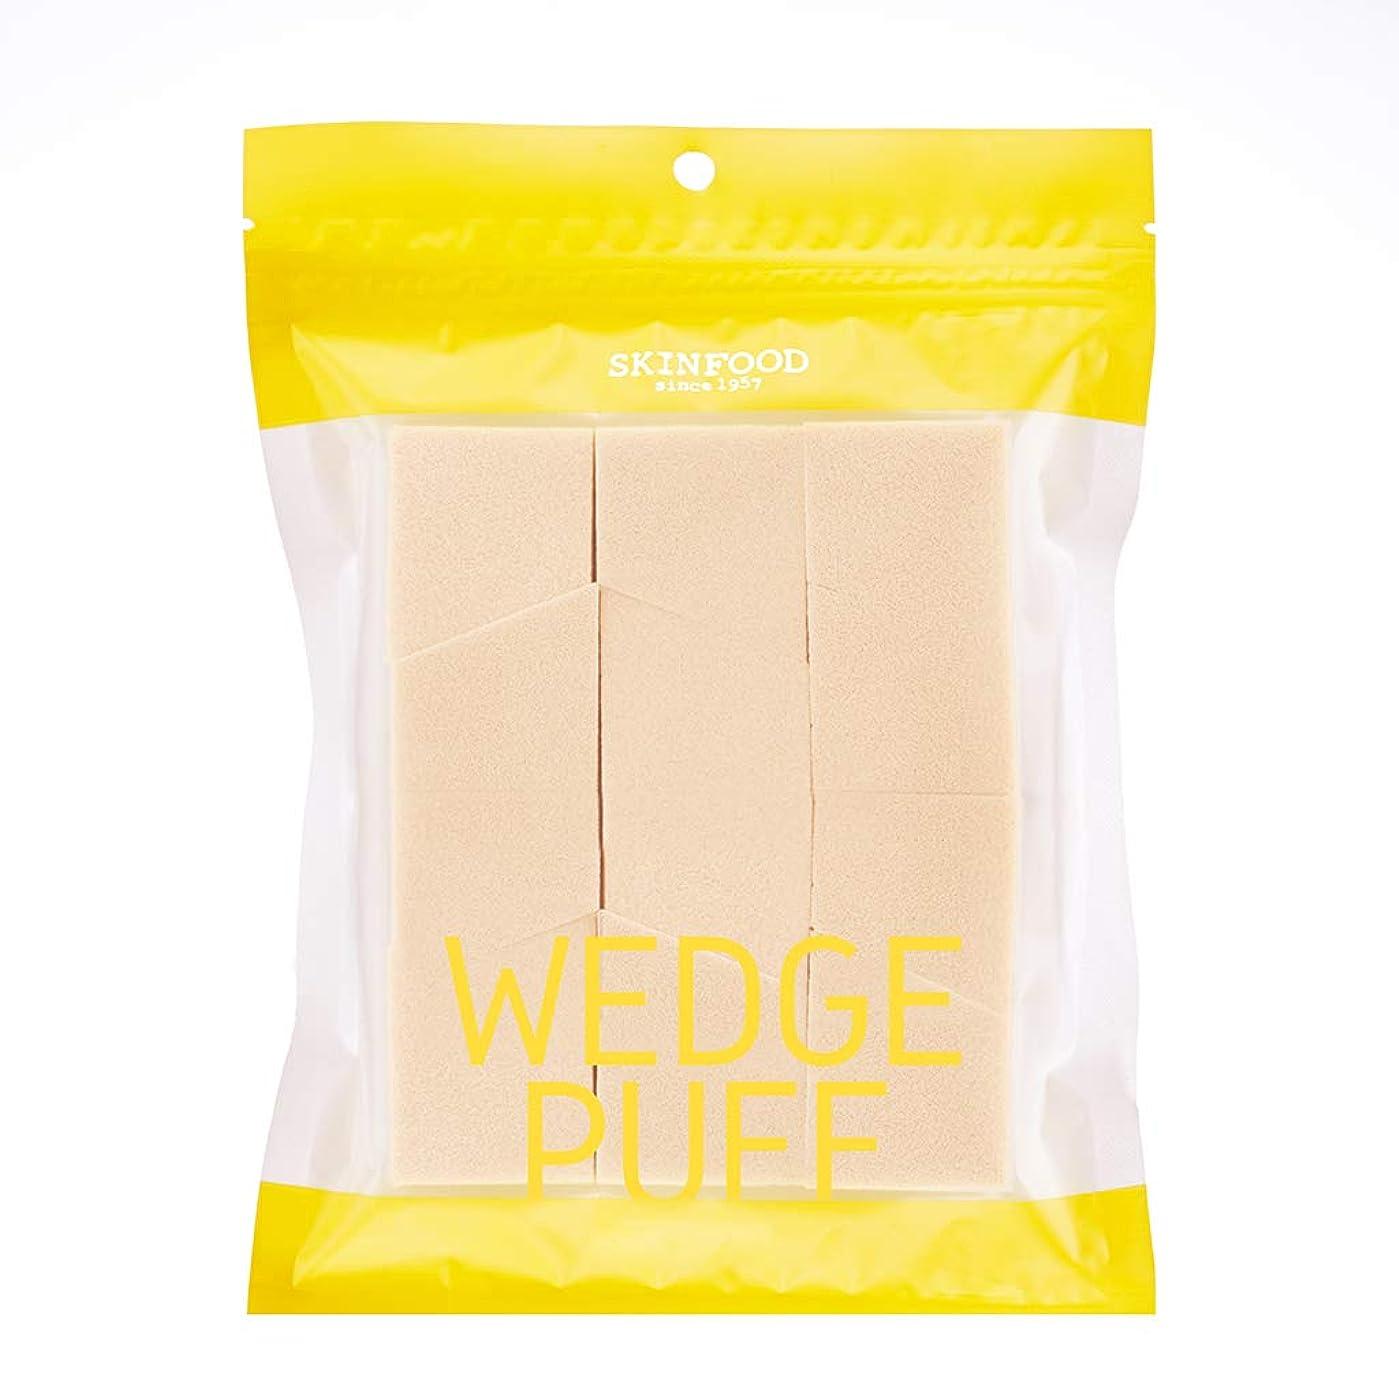 [2016 New] SKINFOOD Wedge Puff Sponge Jumbo Size (12pcs)/スキンフード ウェッジ パフ スポンジ ジャンボサイズ (12個入り)